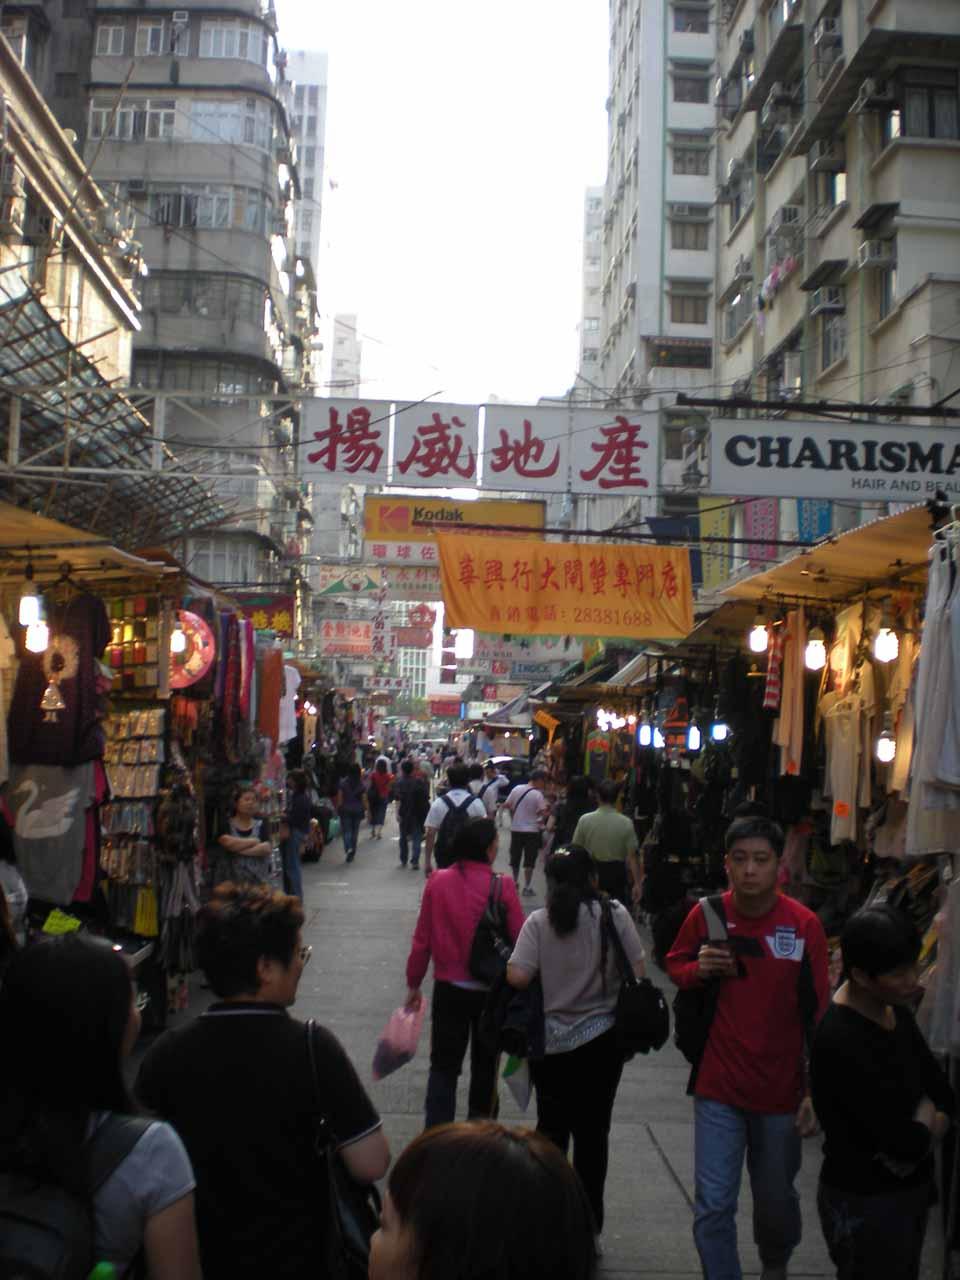 More old school Hong Kong or Kowloon